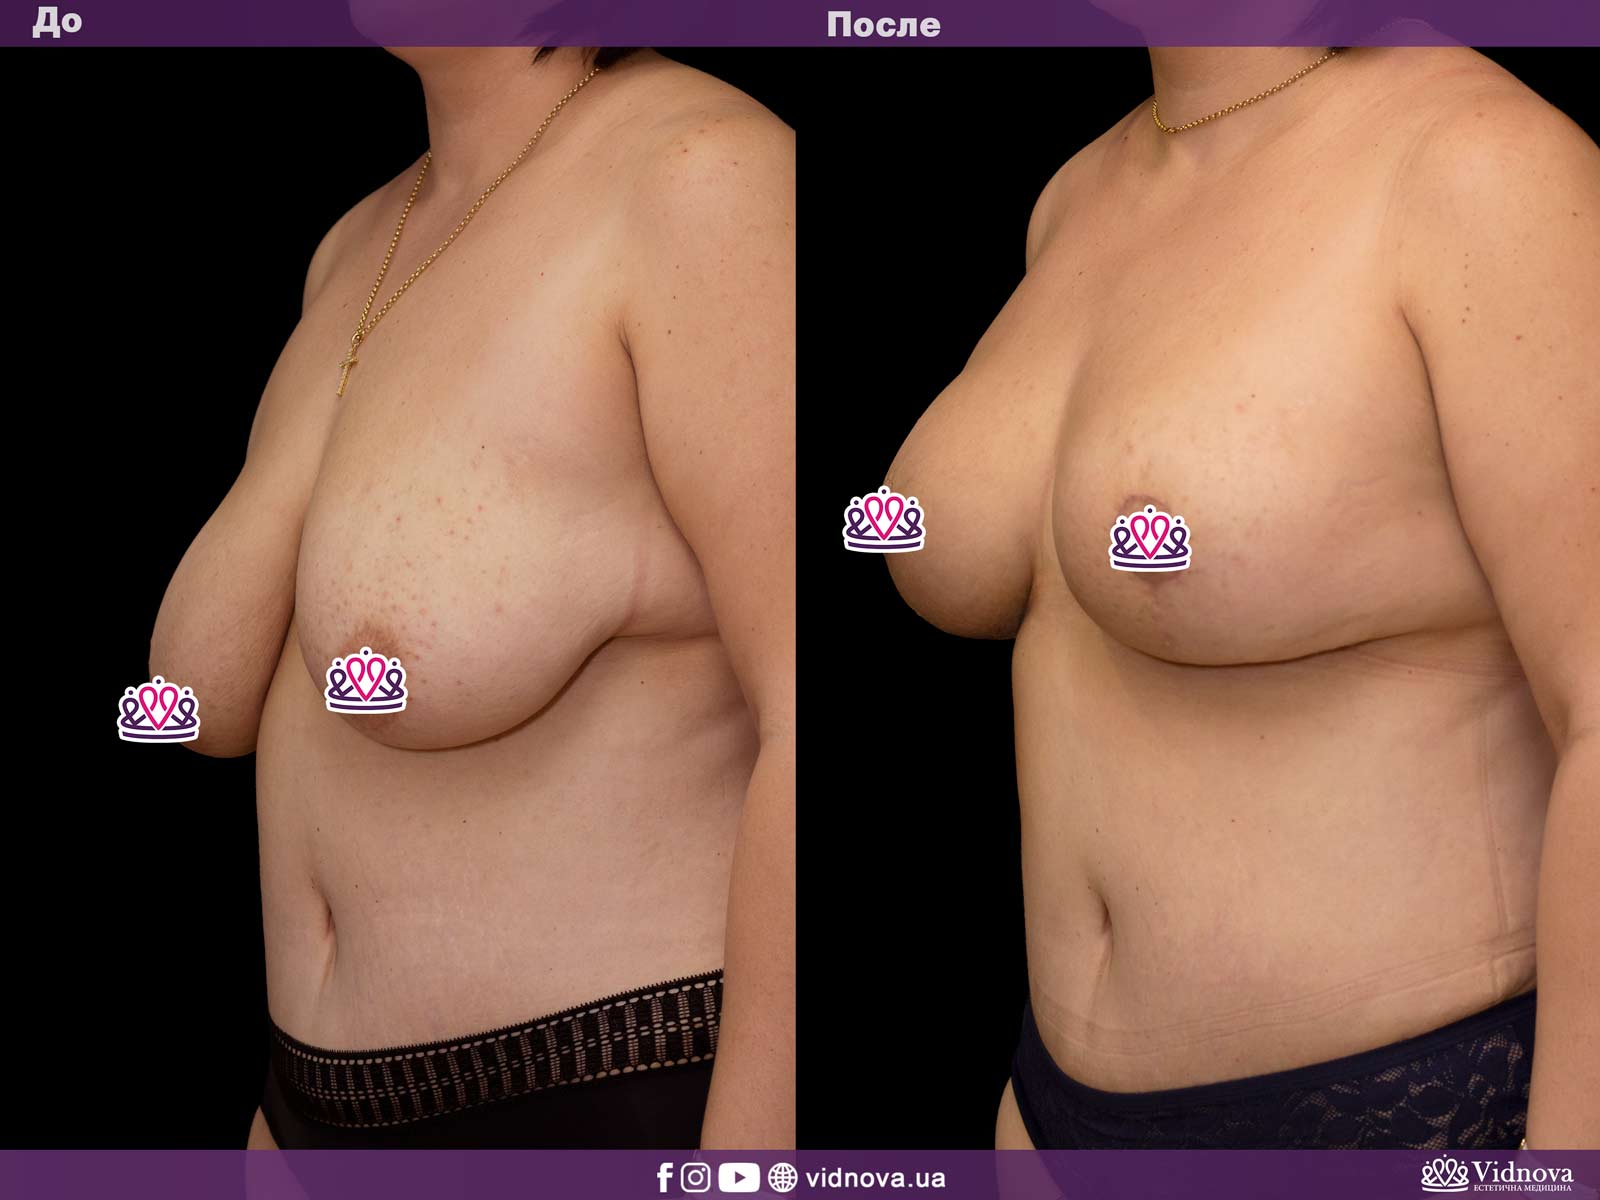 Подтяжка груди: Фото ДО и ПОСЛЕ - Пример №18-2 - Клиника Vidnova